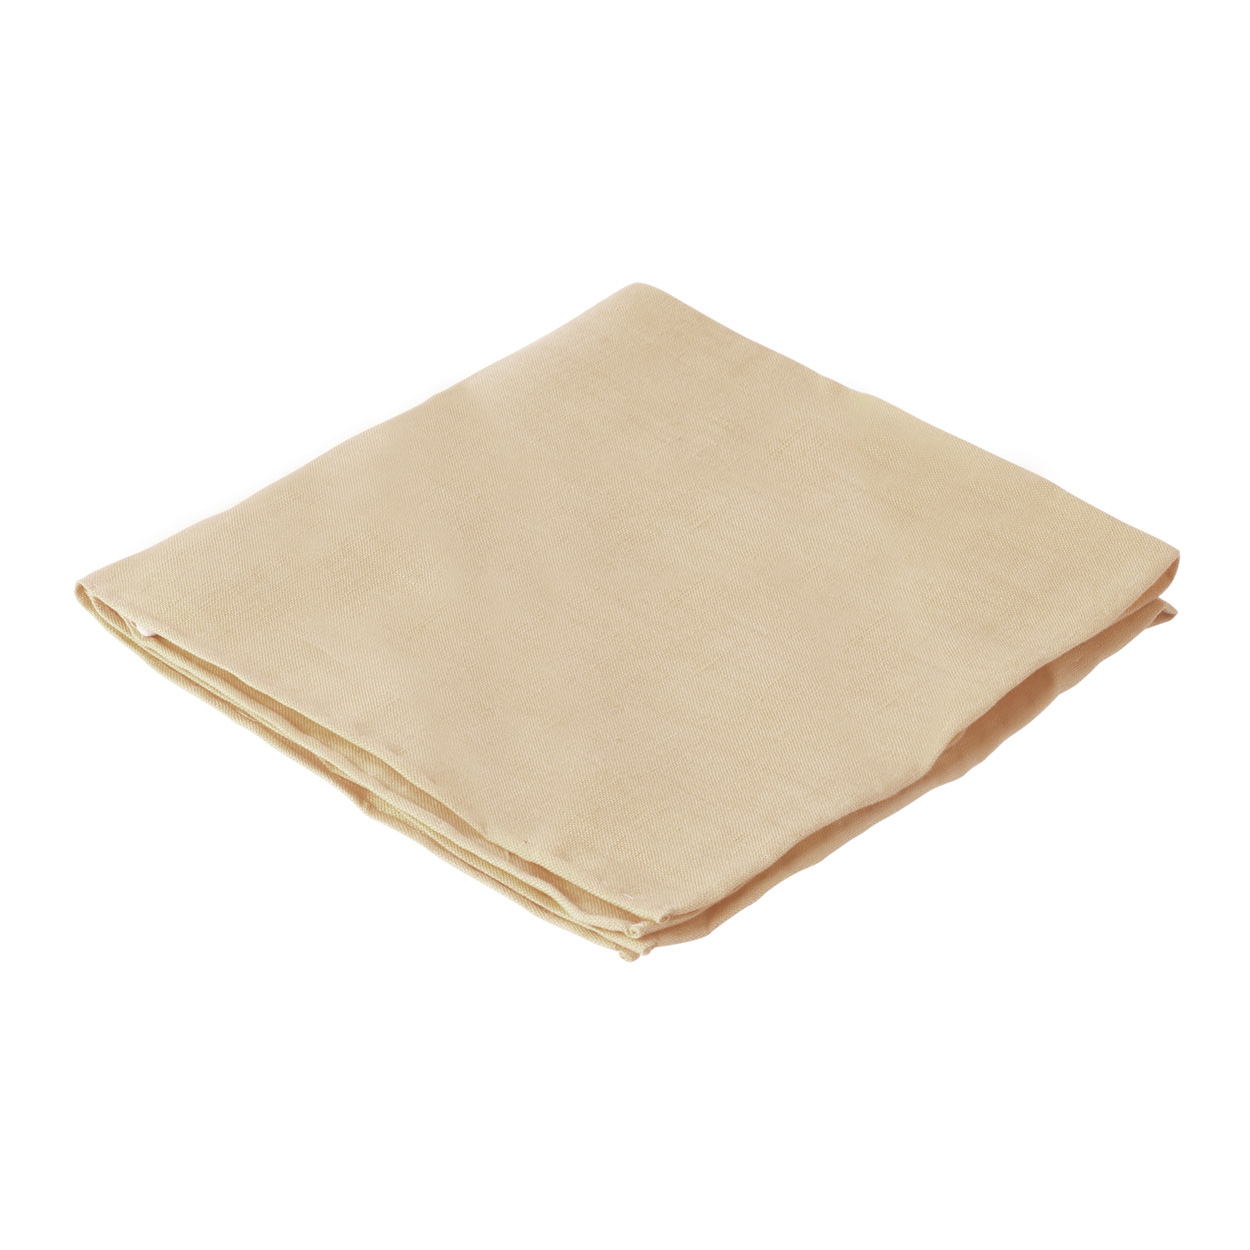 Jacob-Alexander-Linen-Handrolled-15-034-x-15-034-Pocket-Square-Hanky thumbnail 38